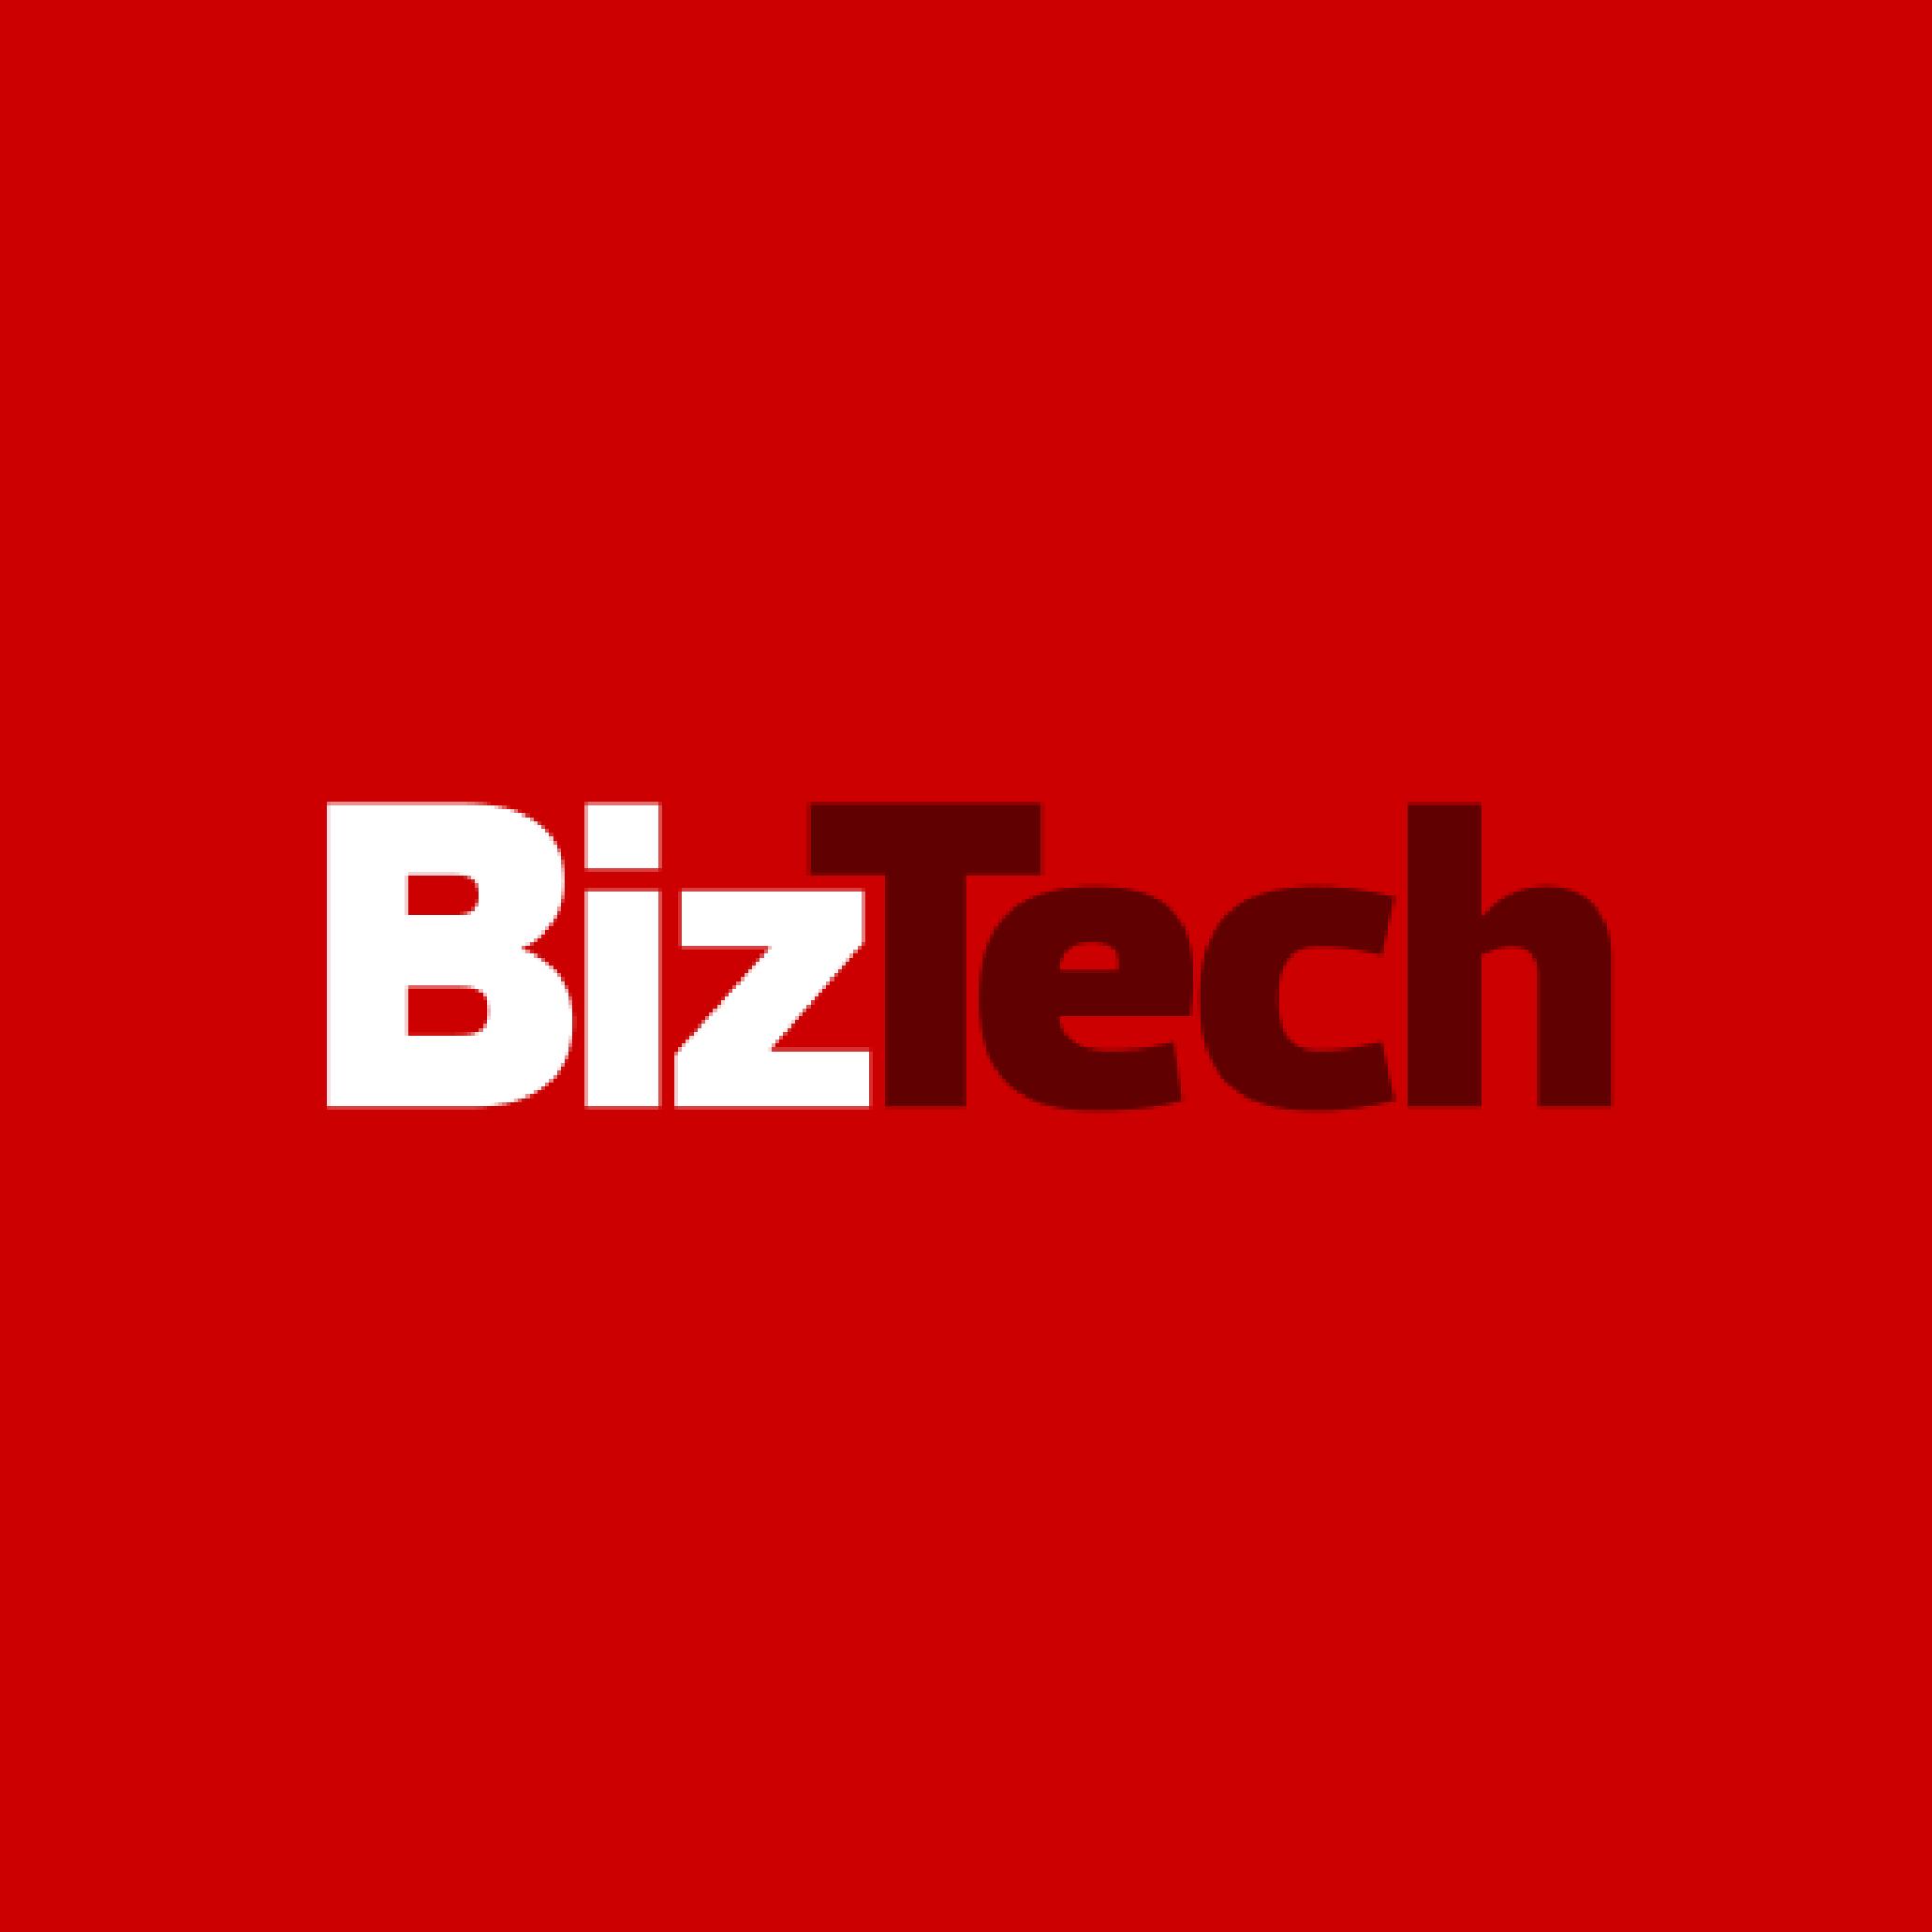 xlogo-biztech402x.png.pagespeed.ic_.sVeBYxOvsfRecolour